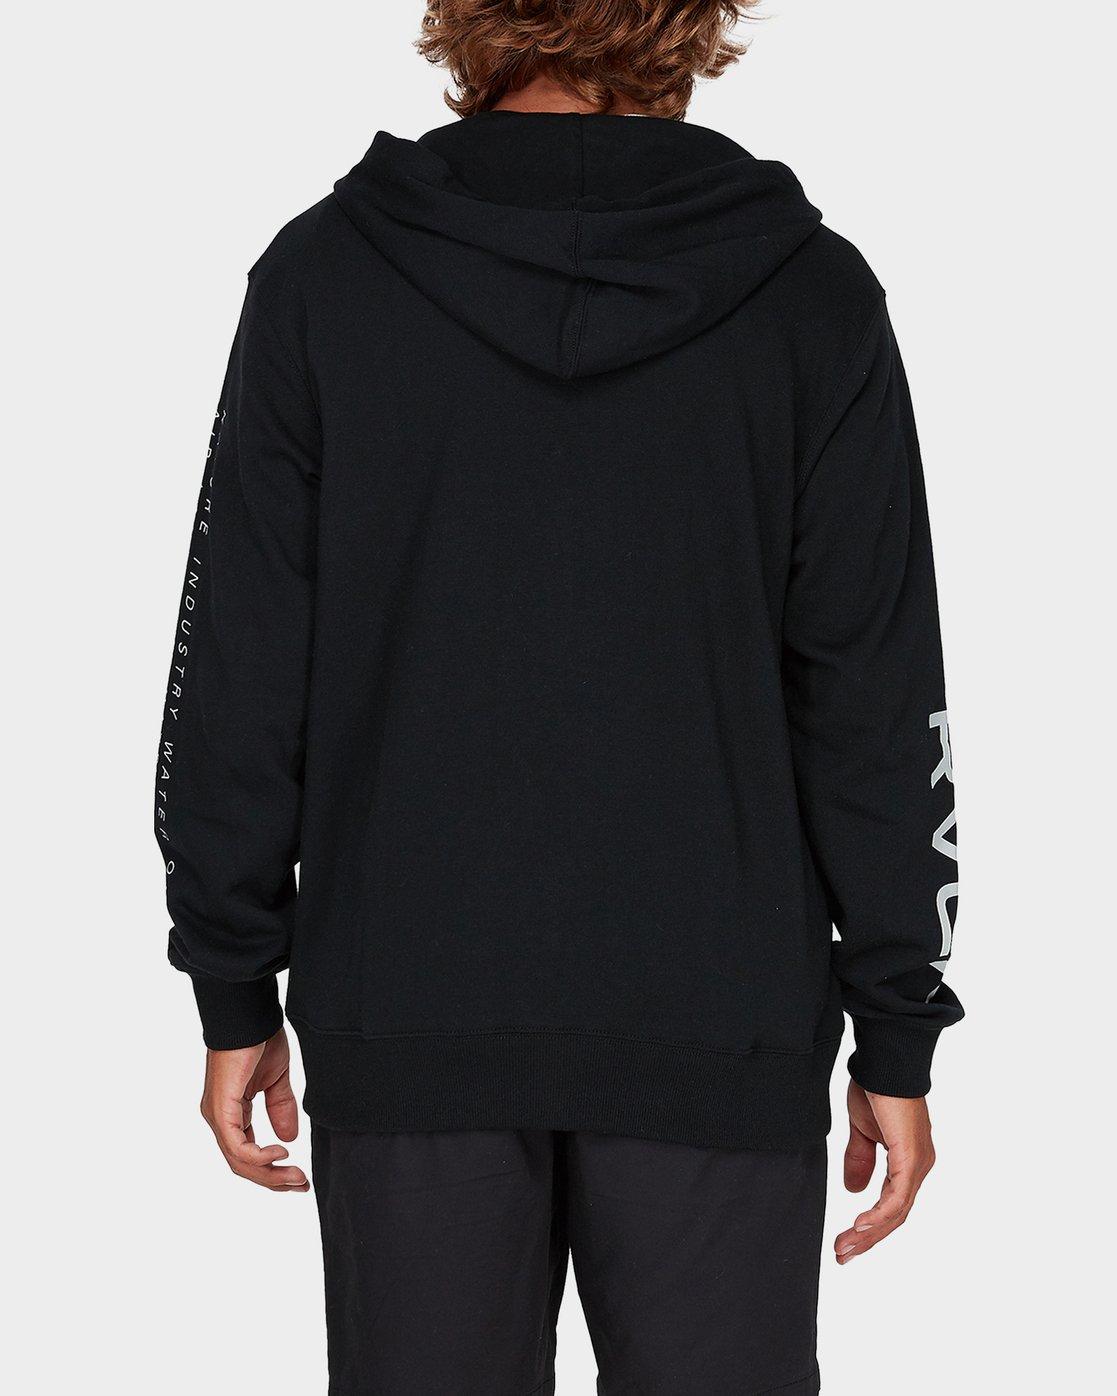 2 Balance Reflect Zip Pullover Hood Black R383152 RVCA